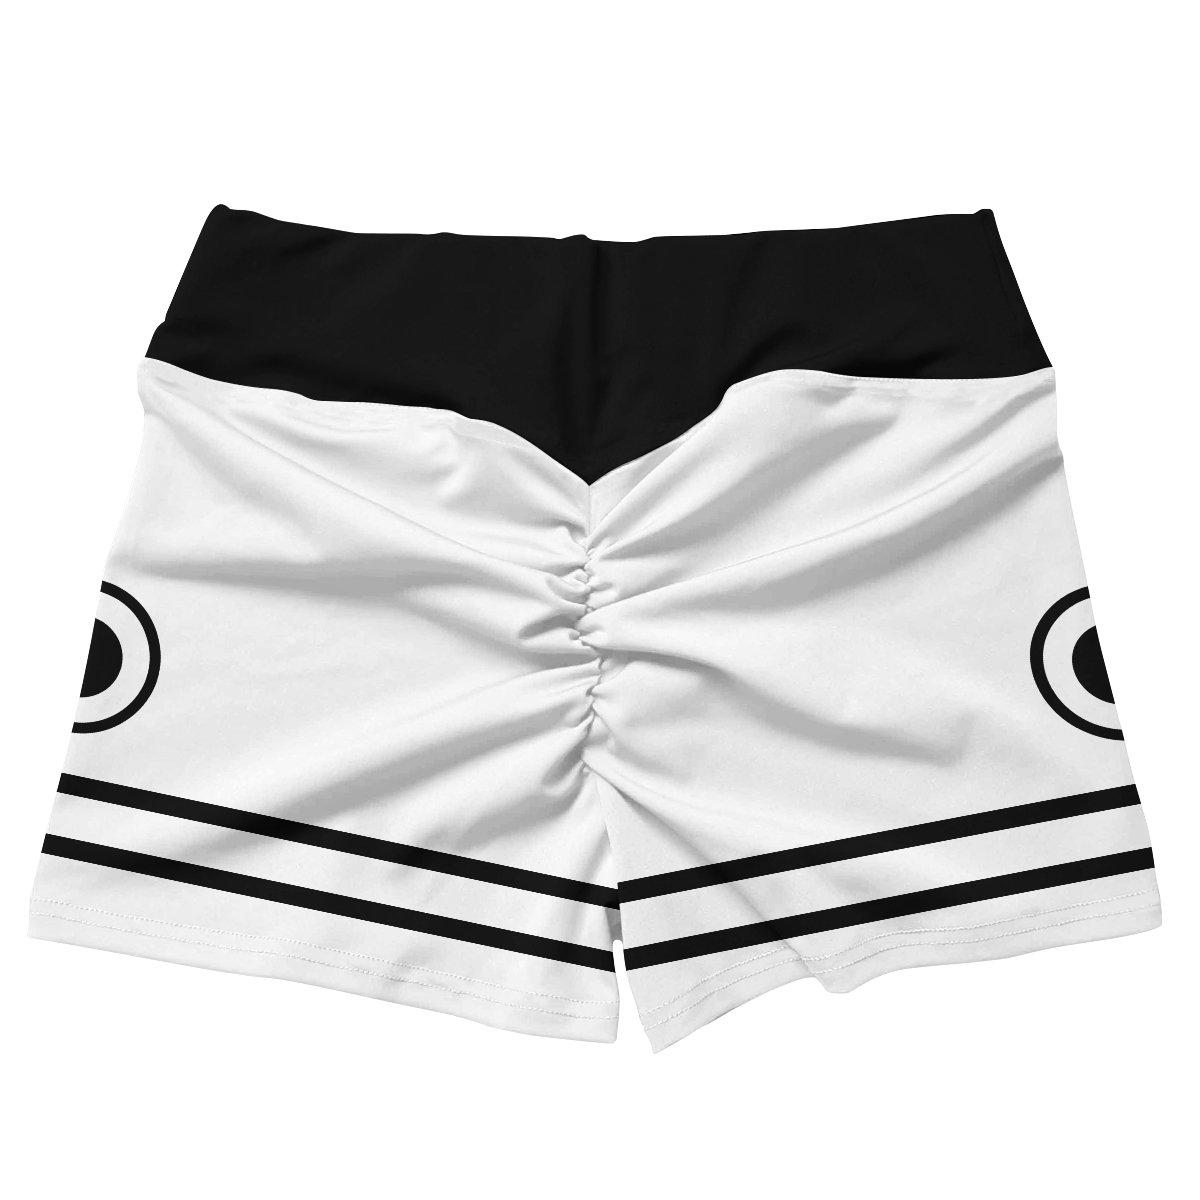 sukuna active wear set 184535 - Anime Swimsuits